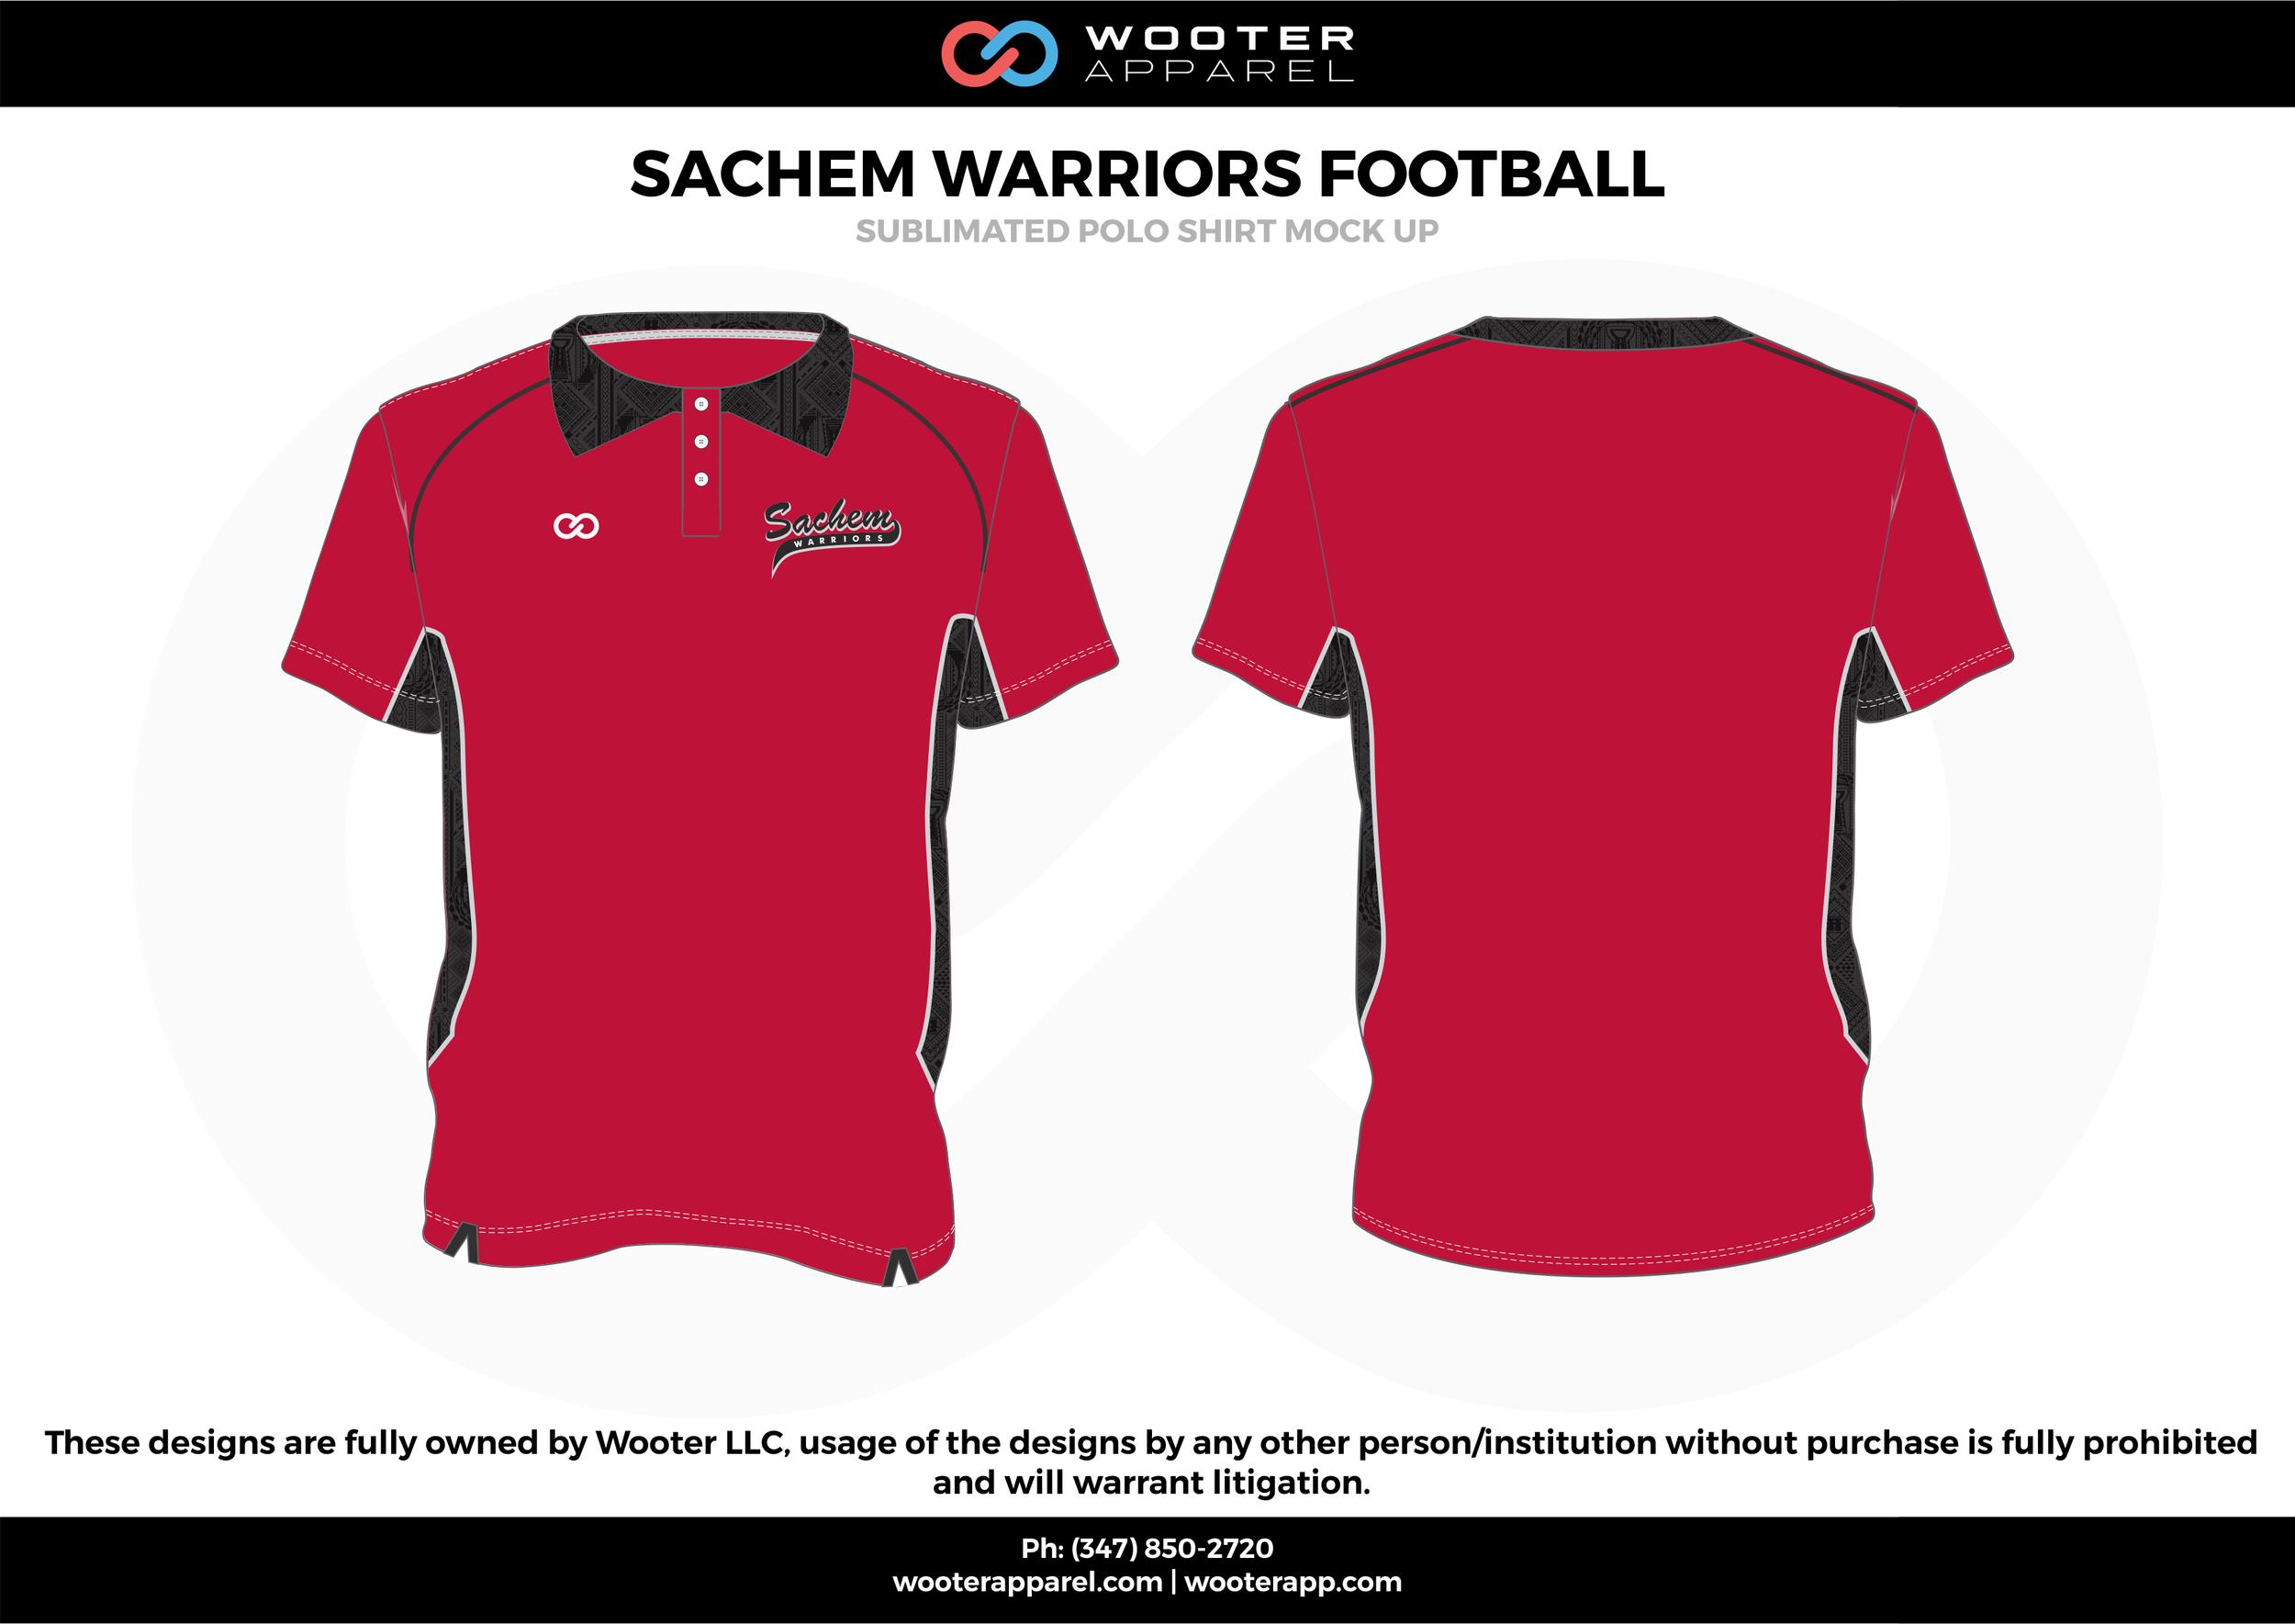 SACHEM WARRIORS FOOTBALL red black gray Polo Shirts